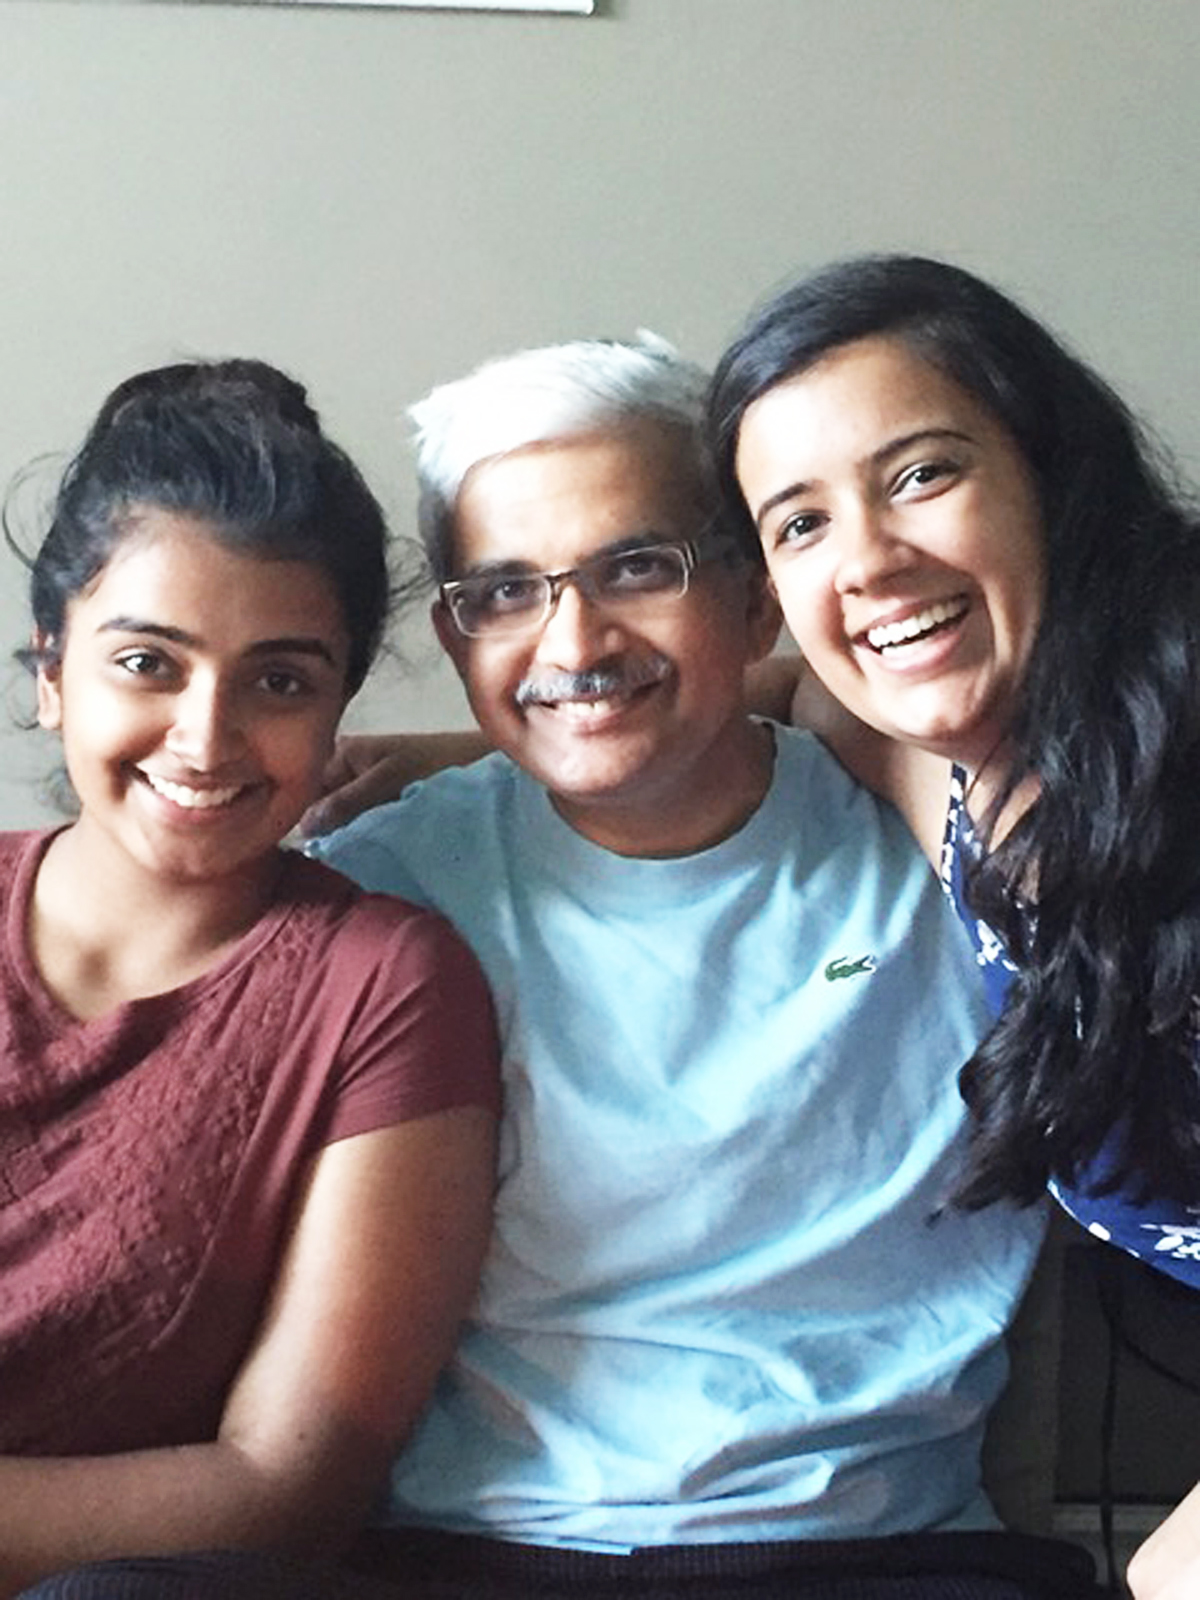 Sukesh Kumar, Partner, KPMG LLP - NEVER STOP BELIEVING